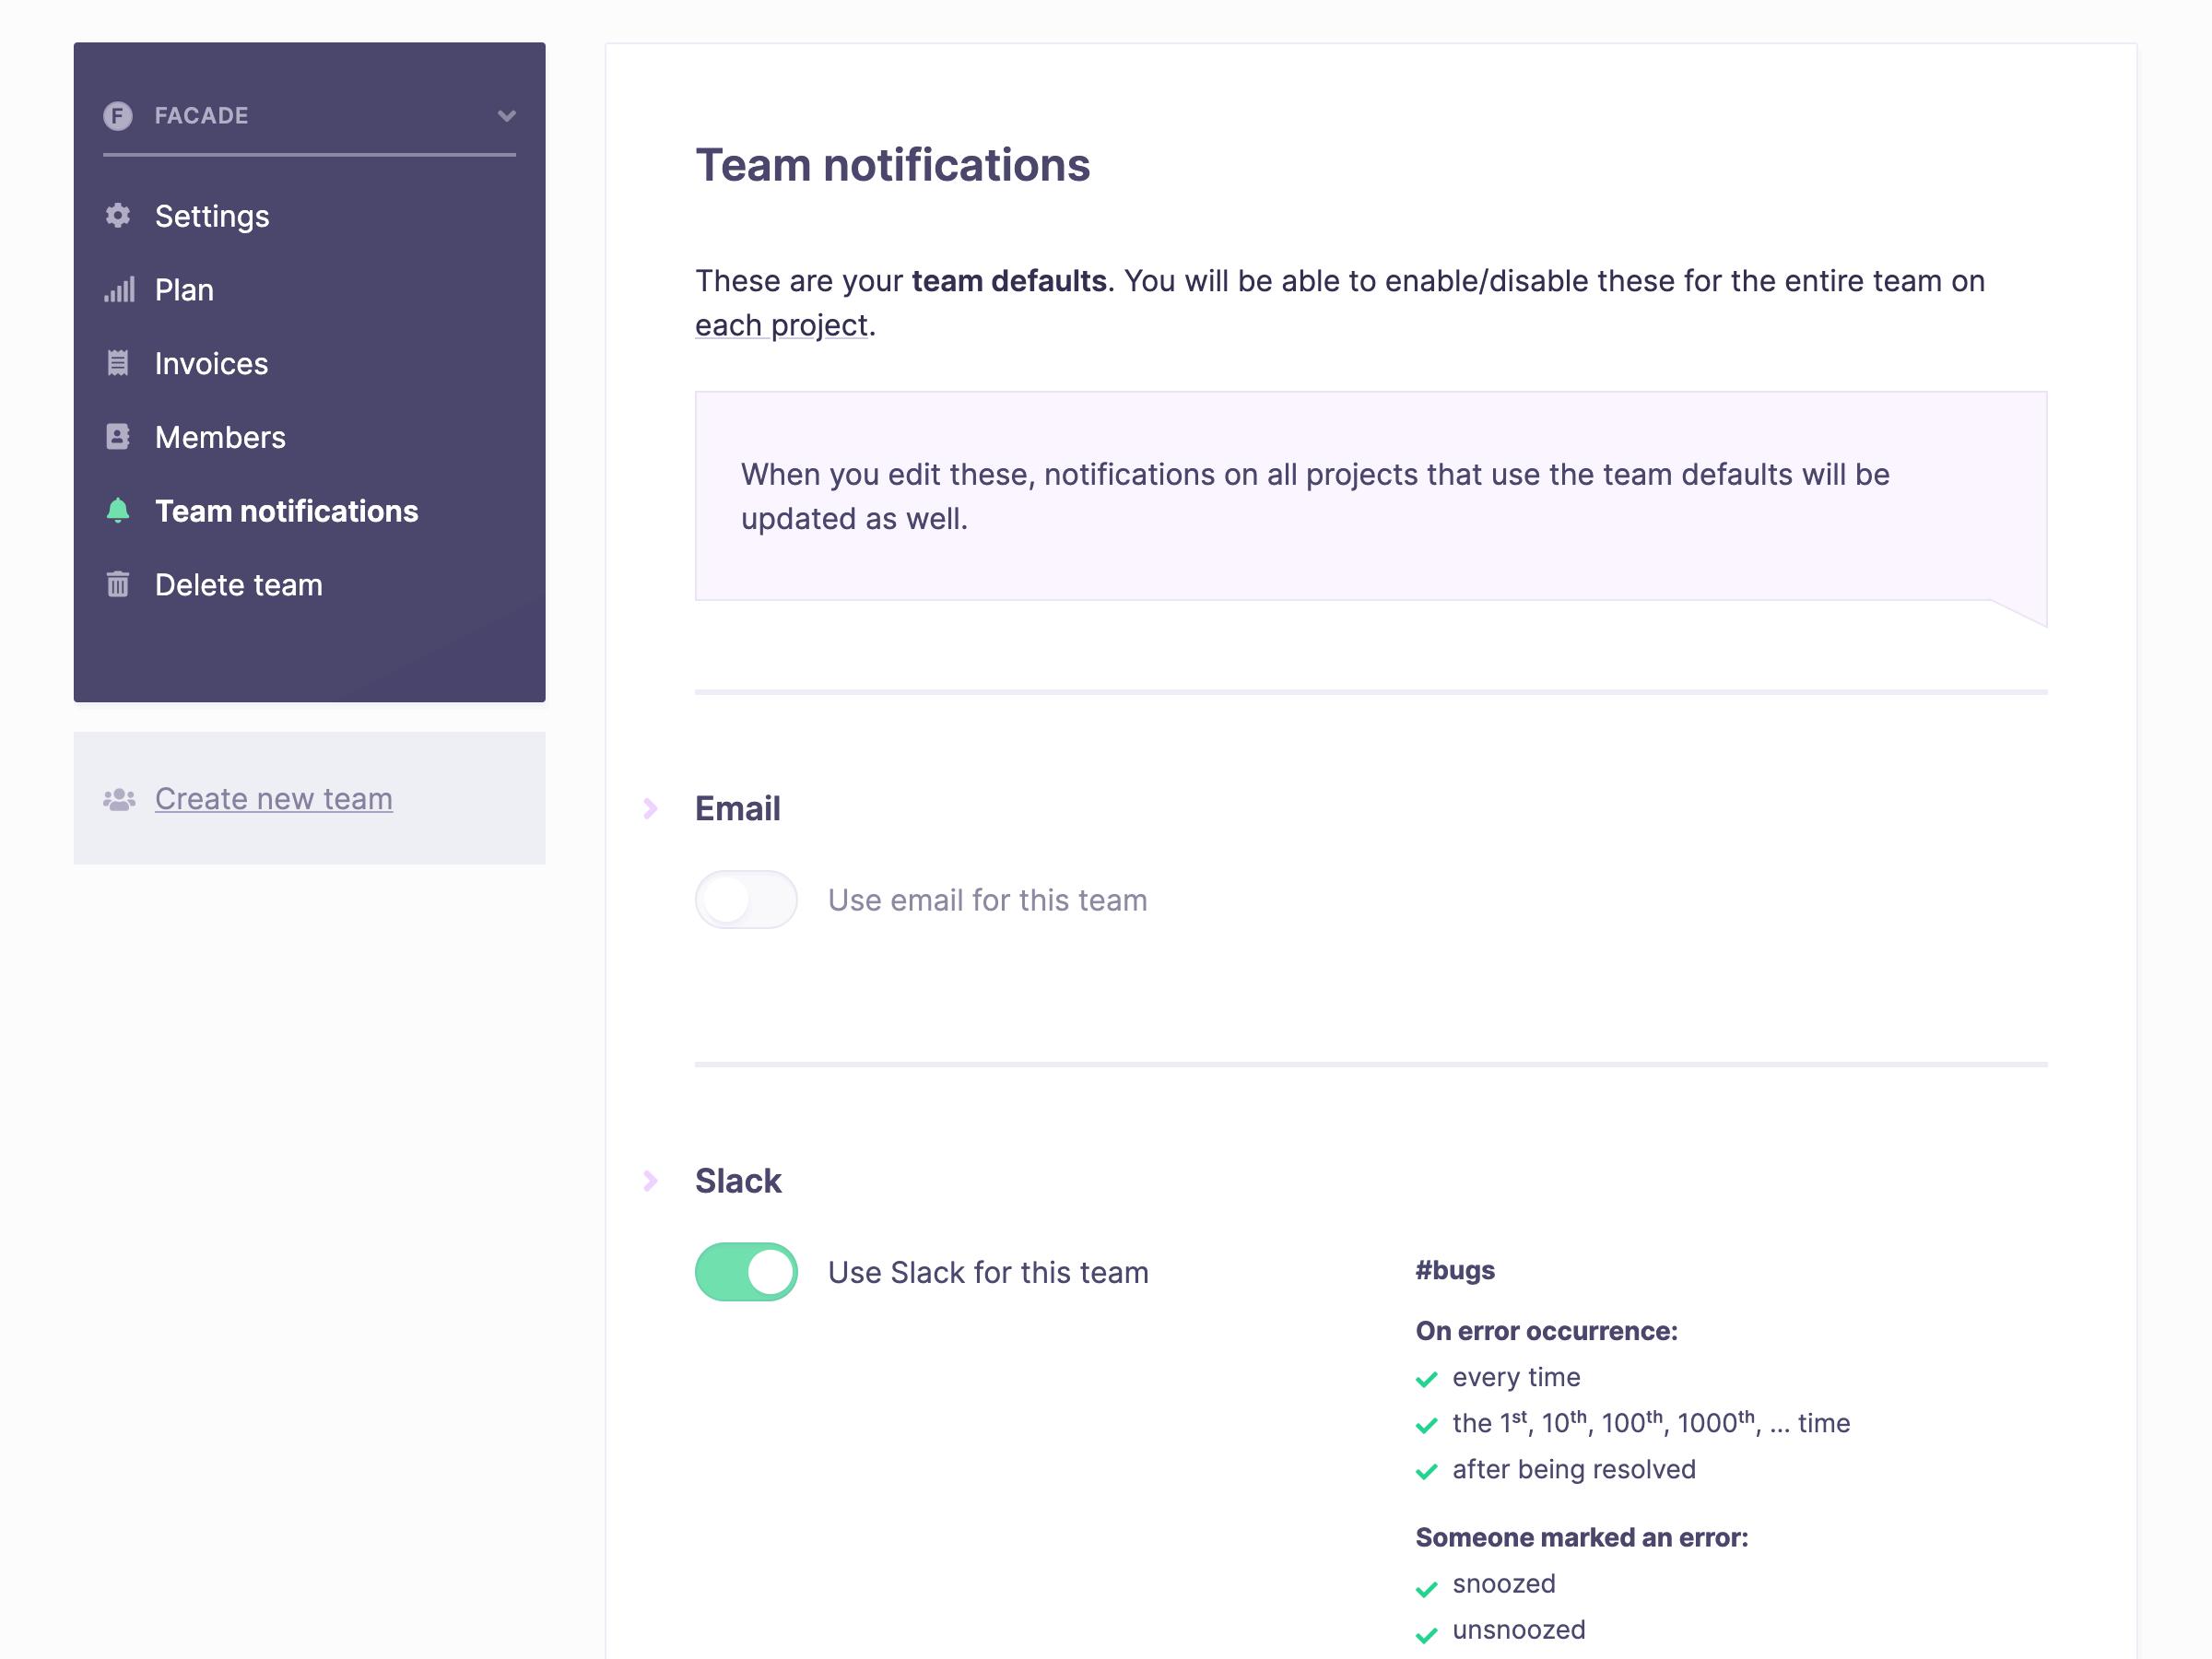 Screenshot of team notifications screen